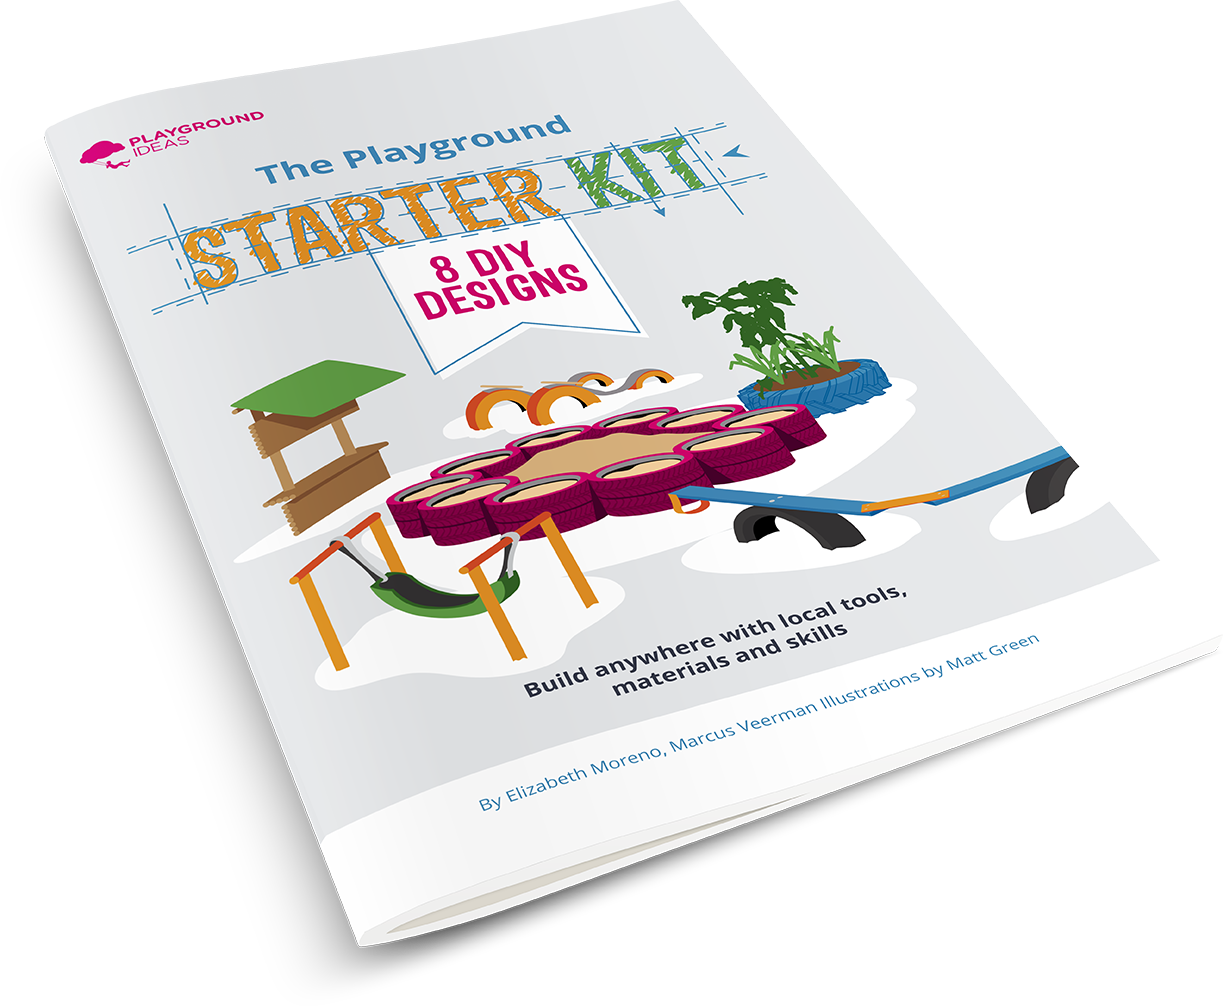 Playground-Starter-Kit